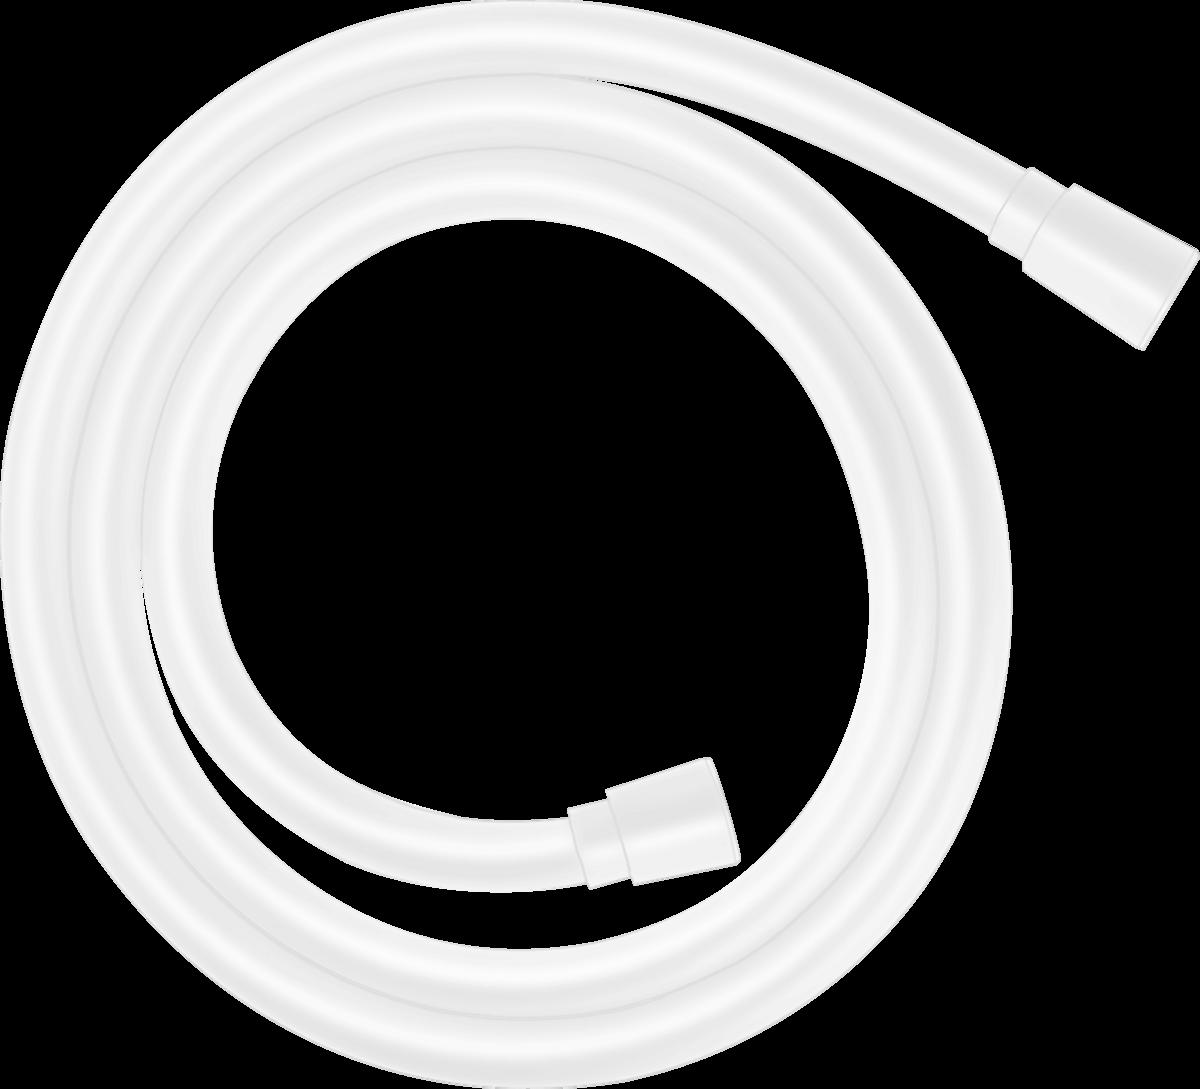 Flexible de douche Hansgrohe Isiflex 1,25 m en blanc mat